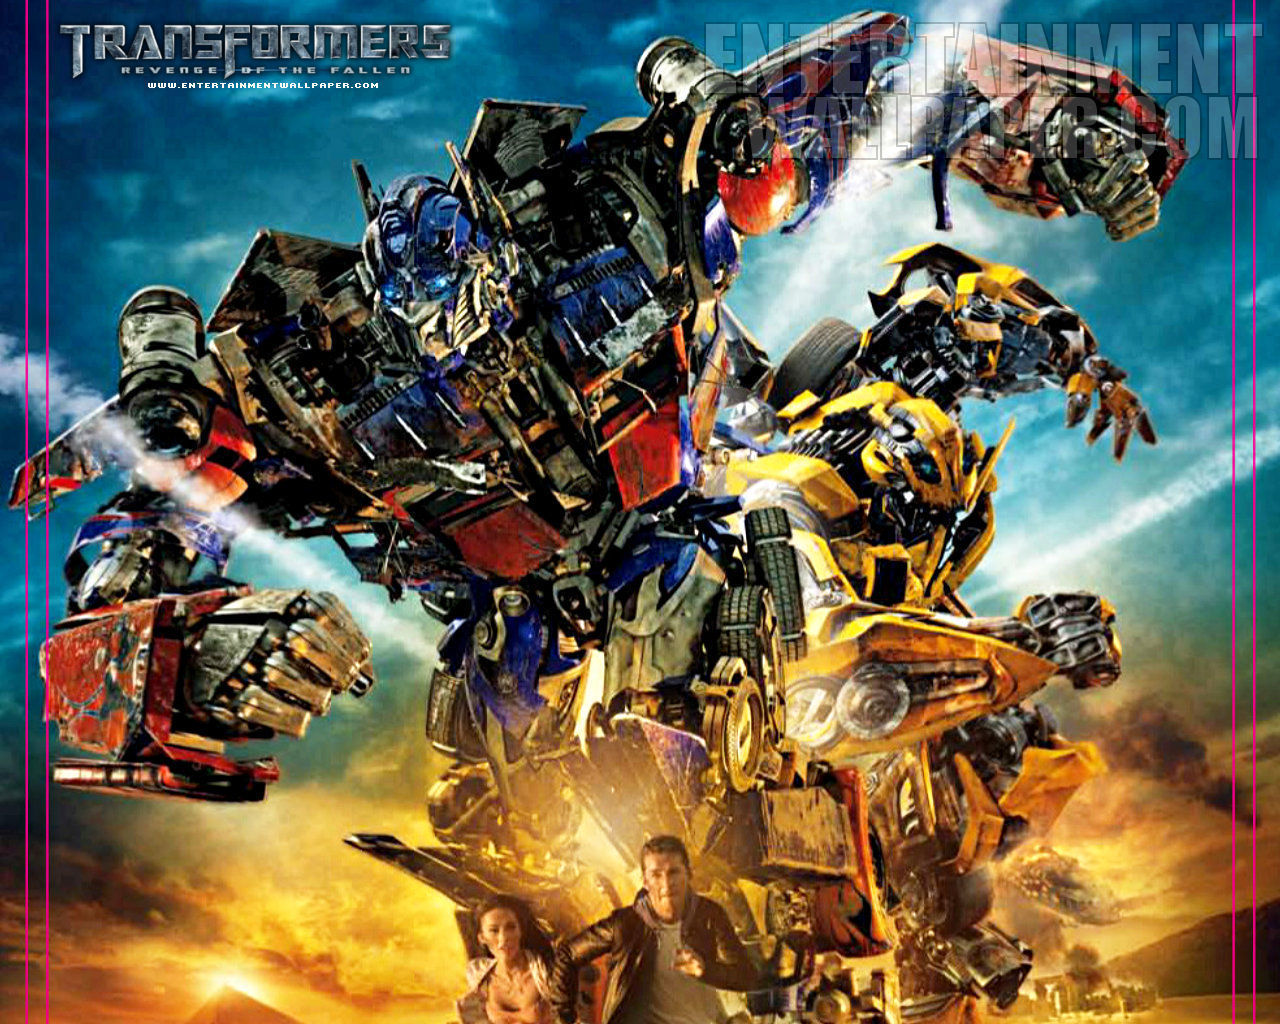 http://2.bp.blogspot.com/-Ir059gEb-Rg/UZRV8n1xxQI/AAAAAAAAyYk/WuFTLn3ZSUs/s1600/Transformers+Wallpapers+(8).jpg